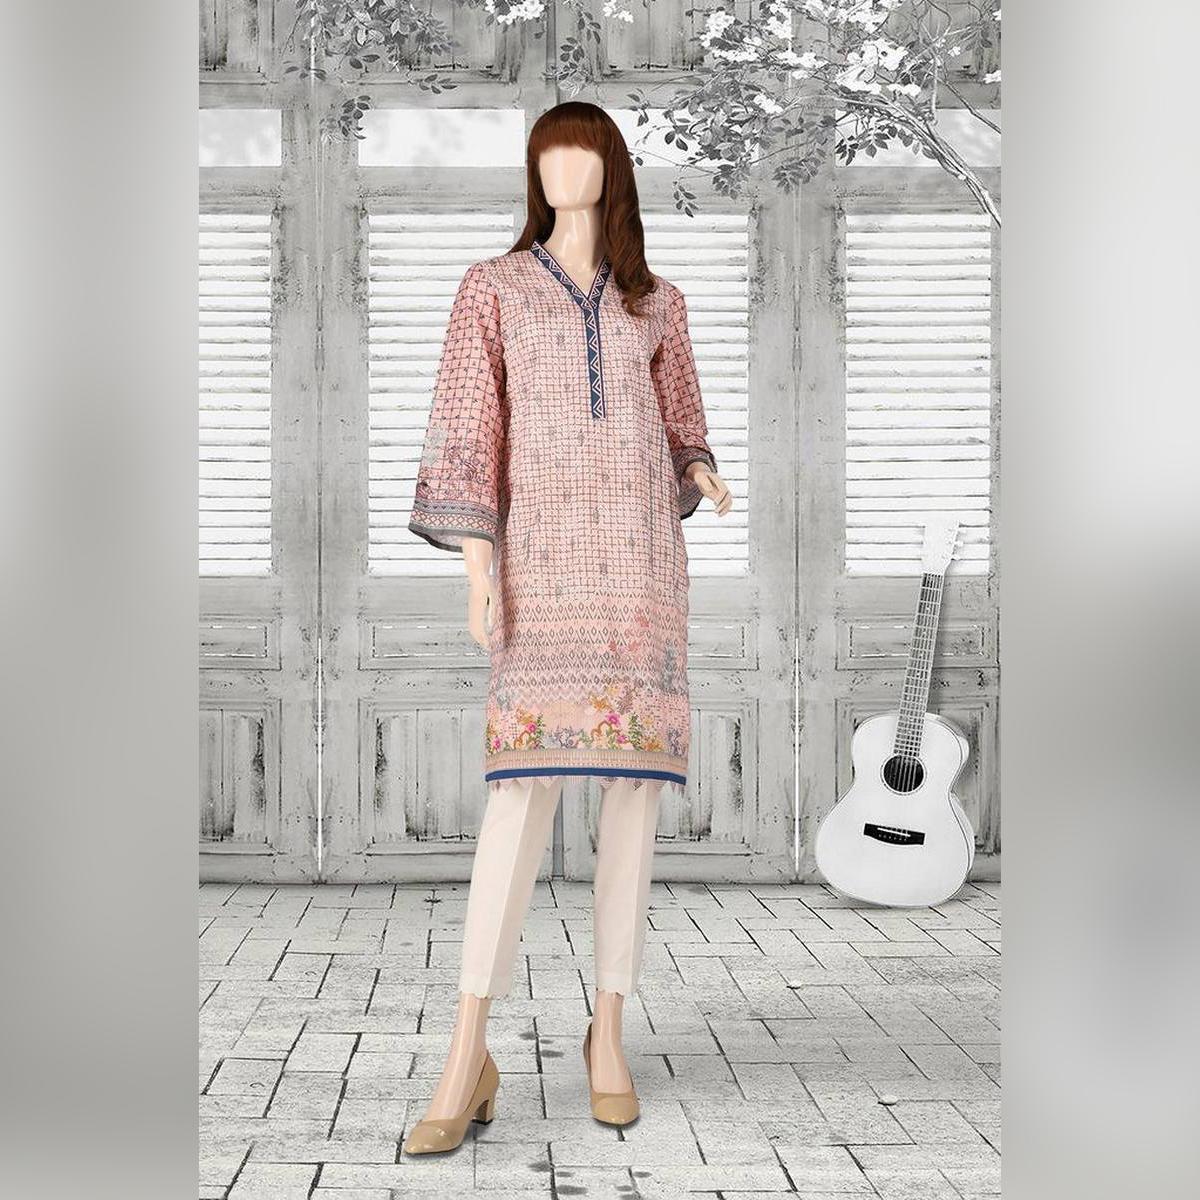 SAYA Pink Unstitch Printed Spring Summer 2021 Lawn Shirt for Women-FIZA UP-2112-03A (SHIRT)